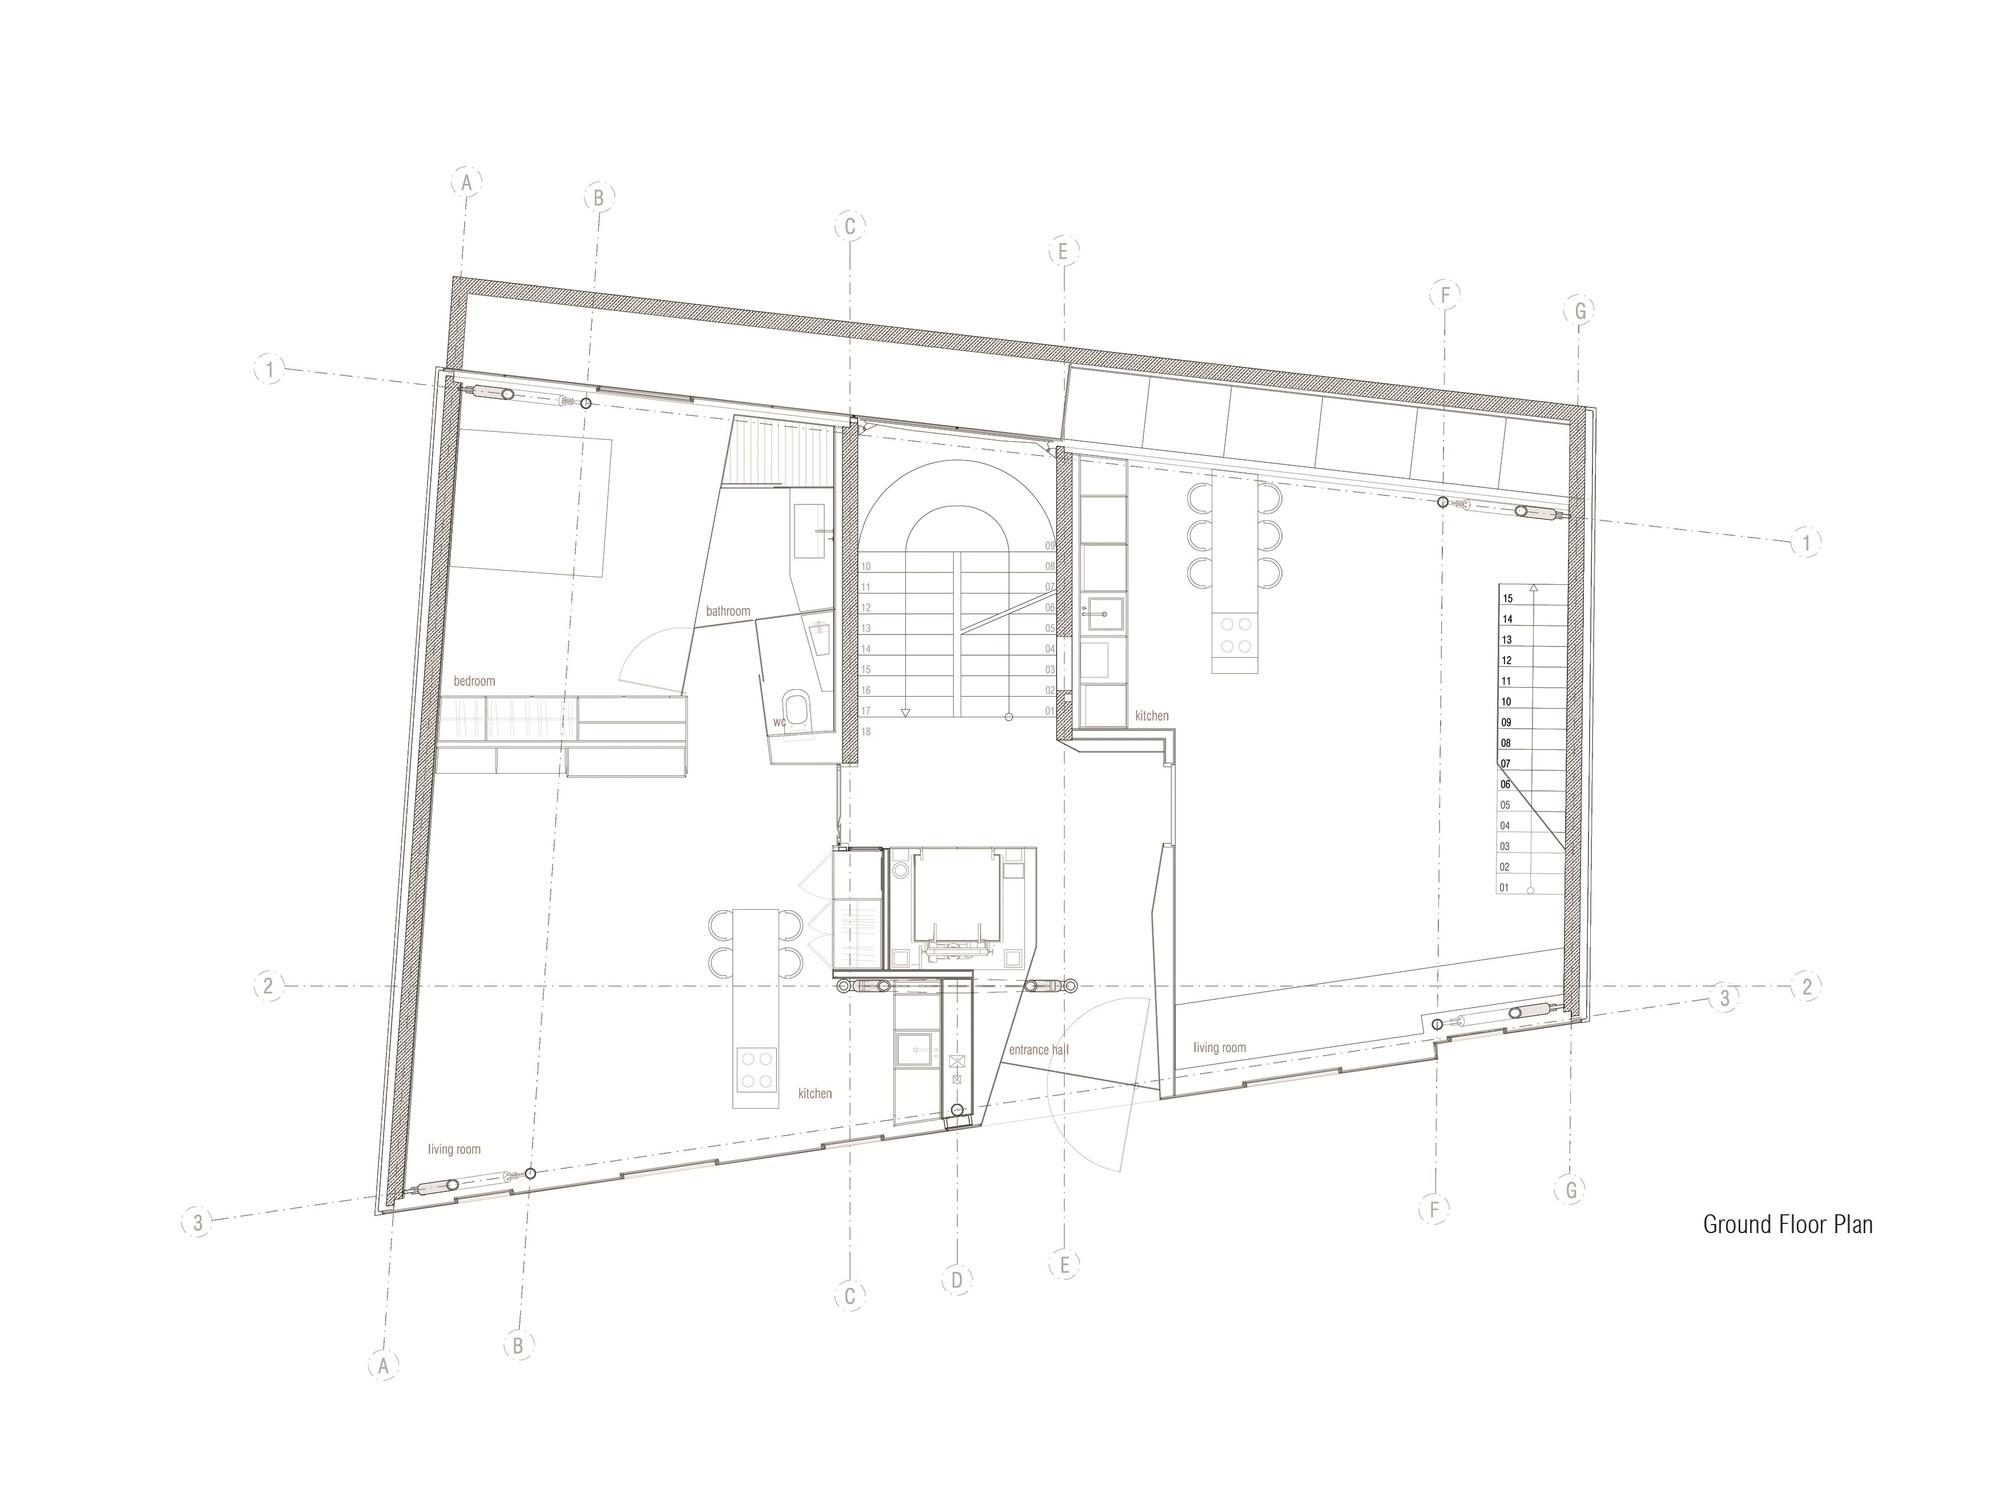 İpera 25 / Alataş Architecture & Consulting